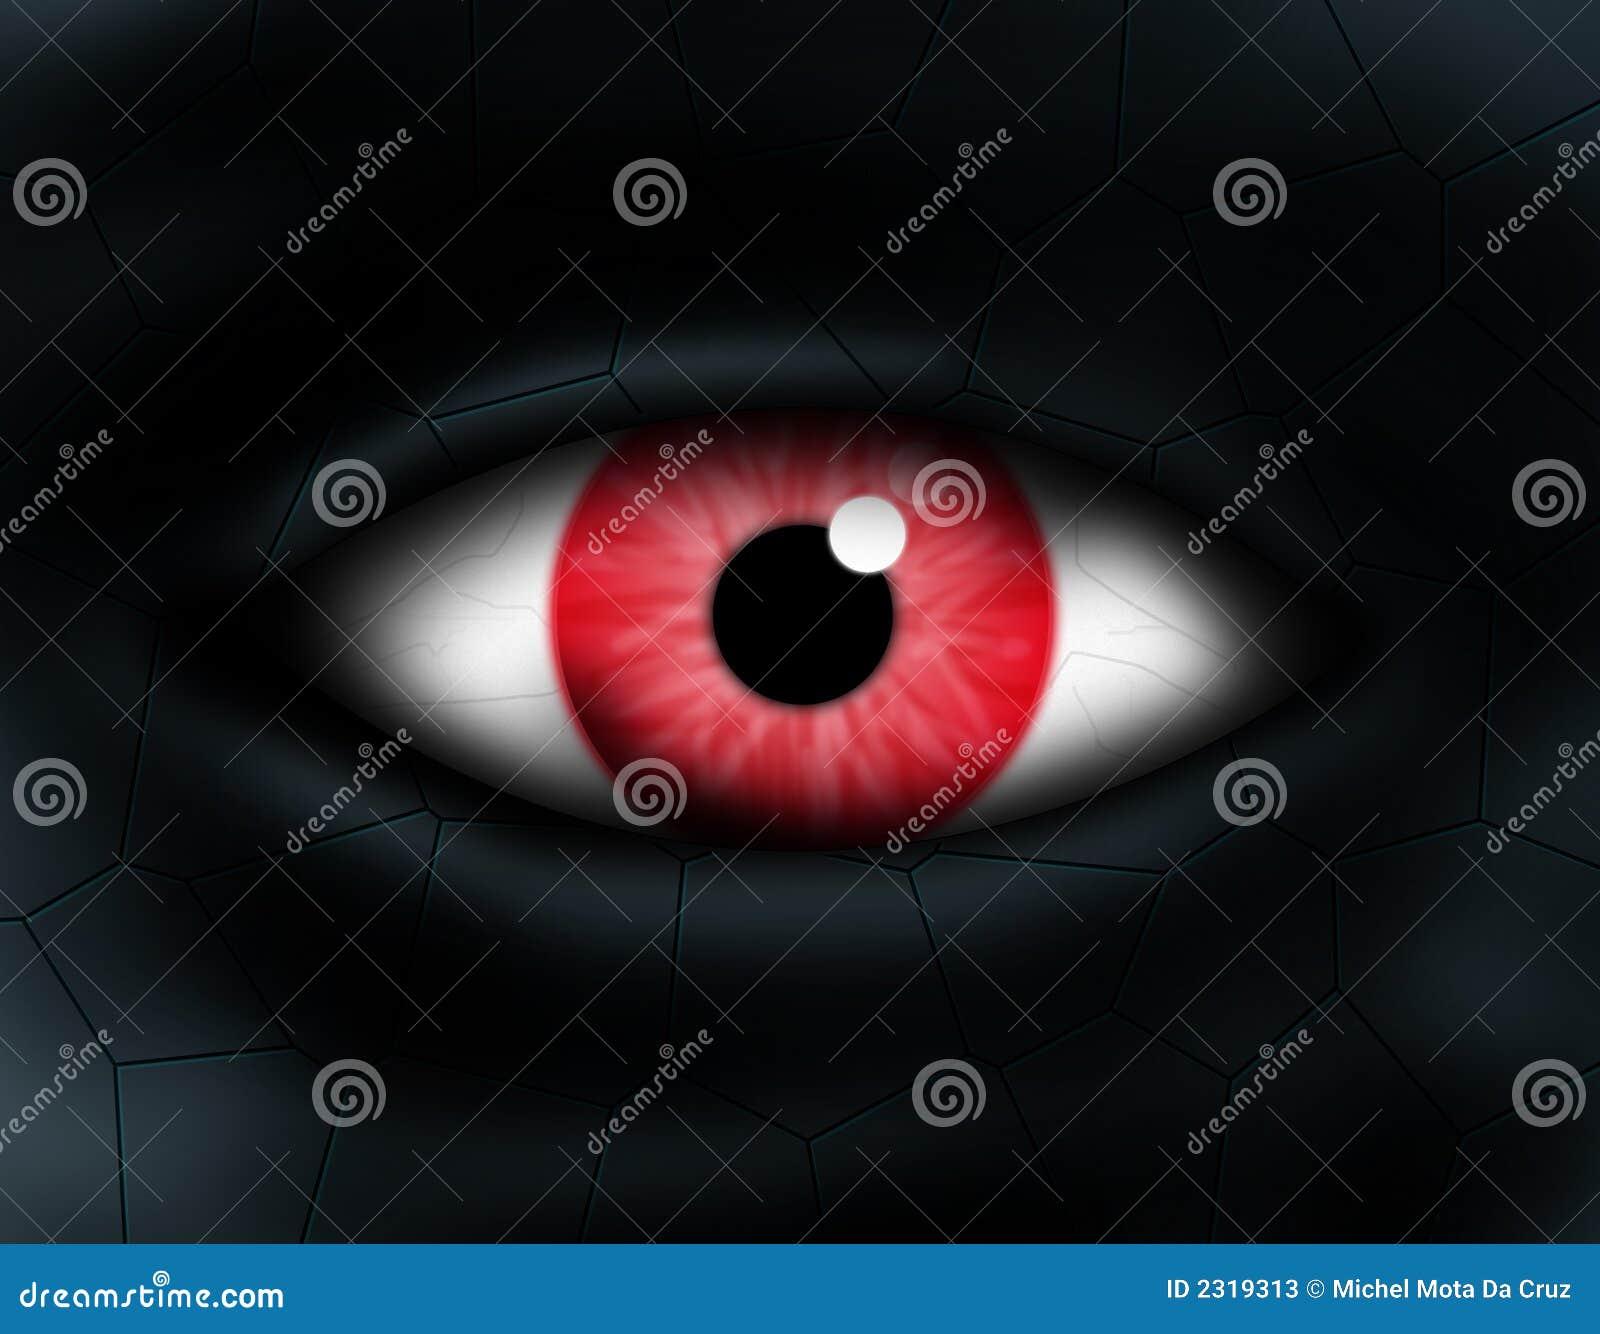 Monster Eye Stock Photos - Image: 2319313